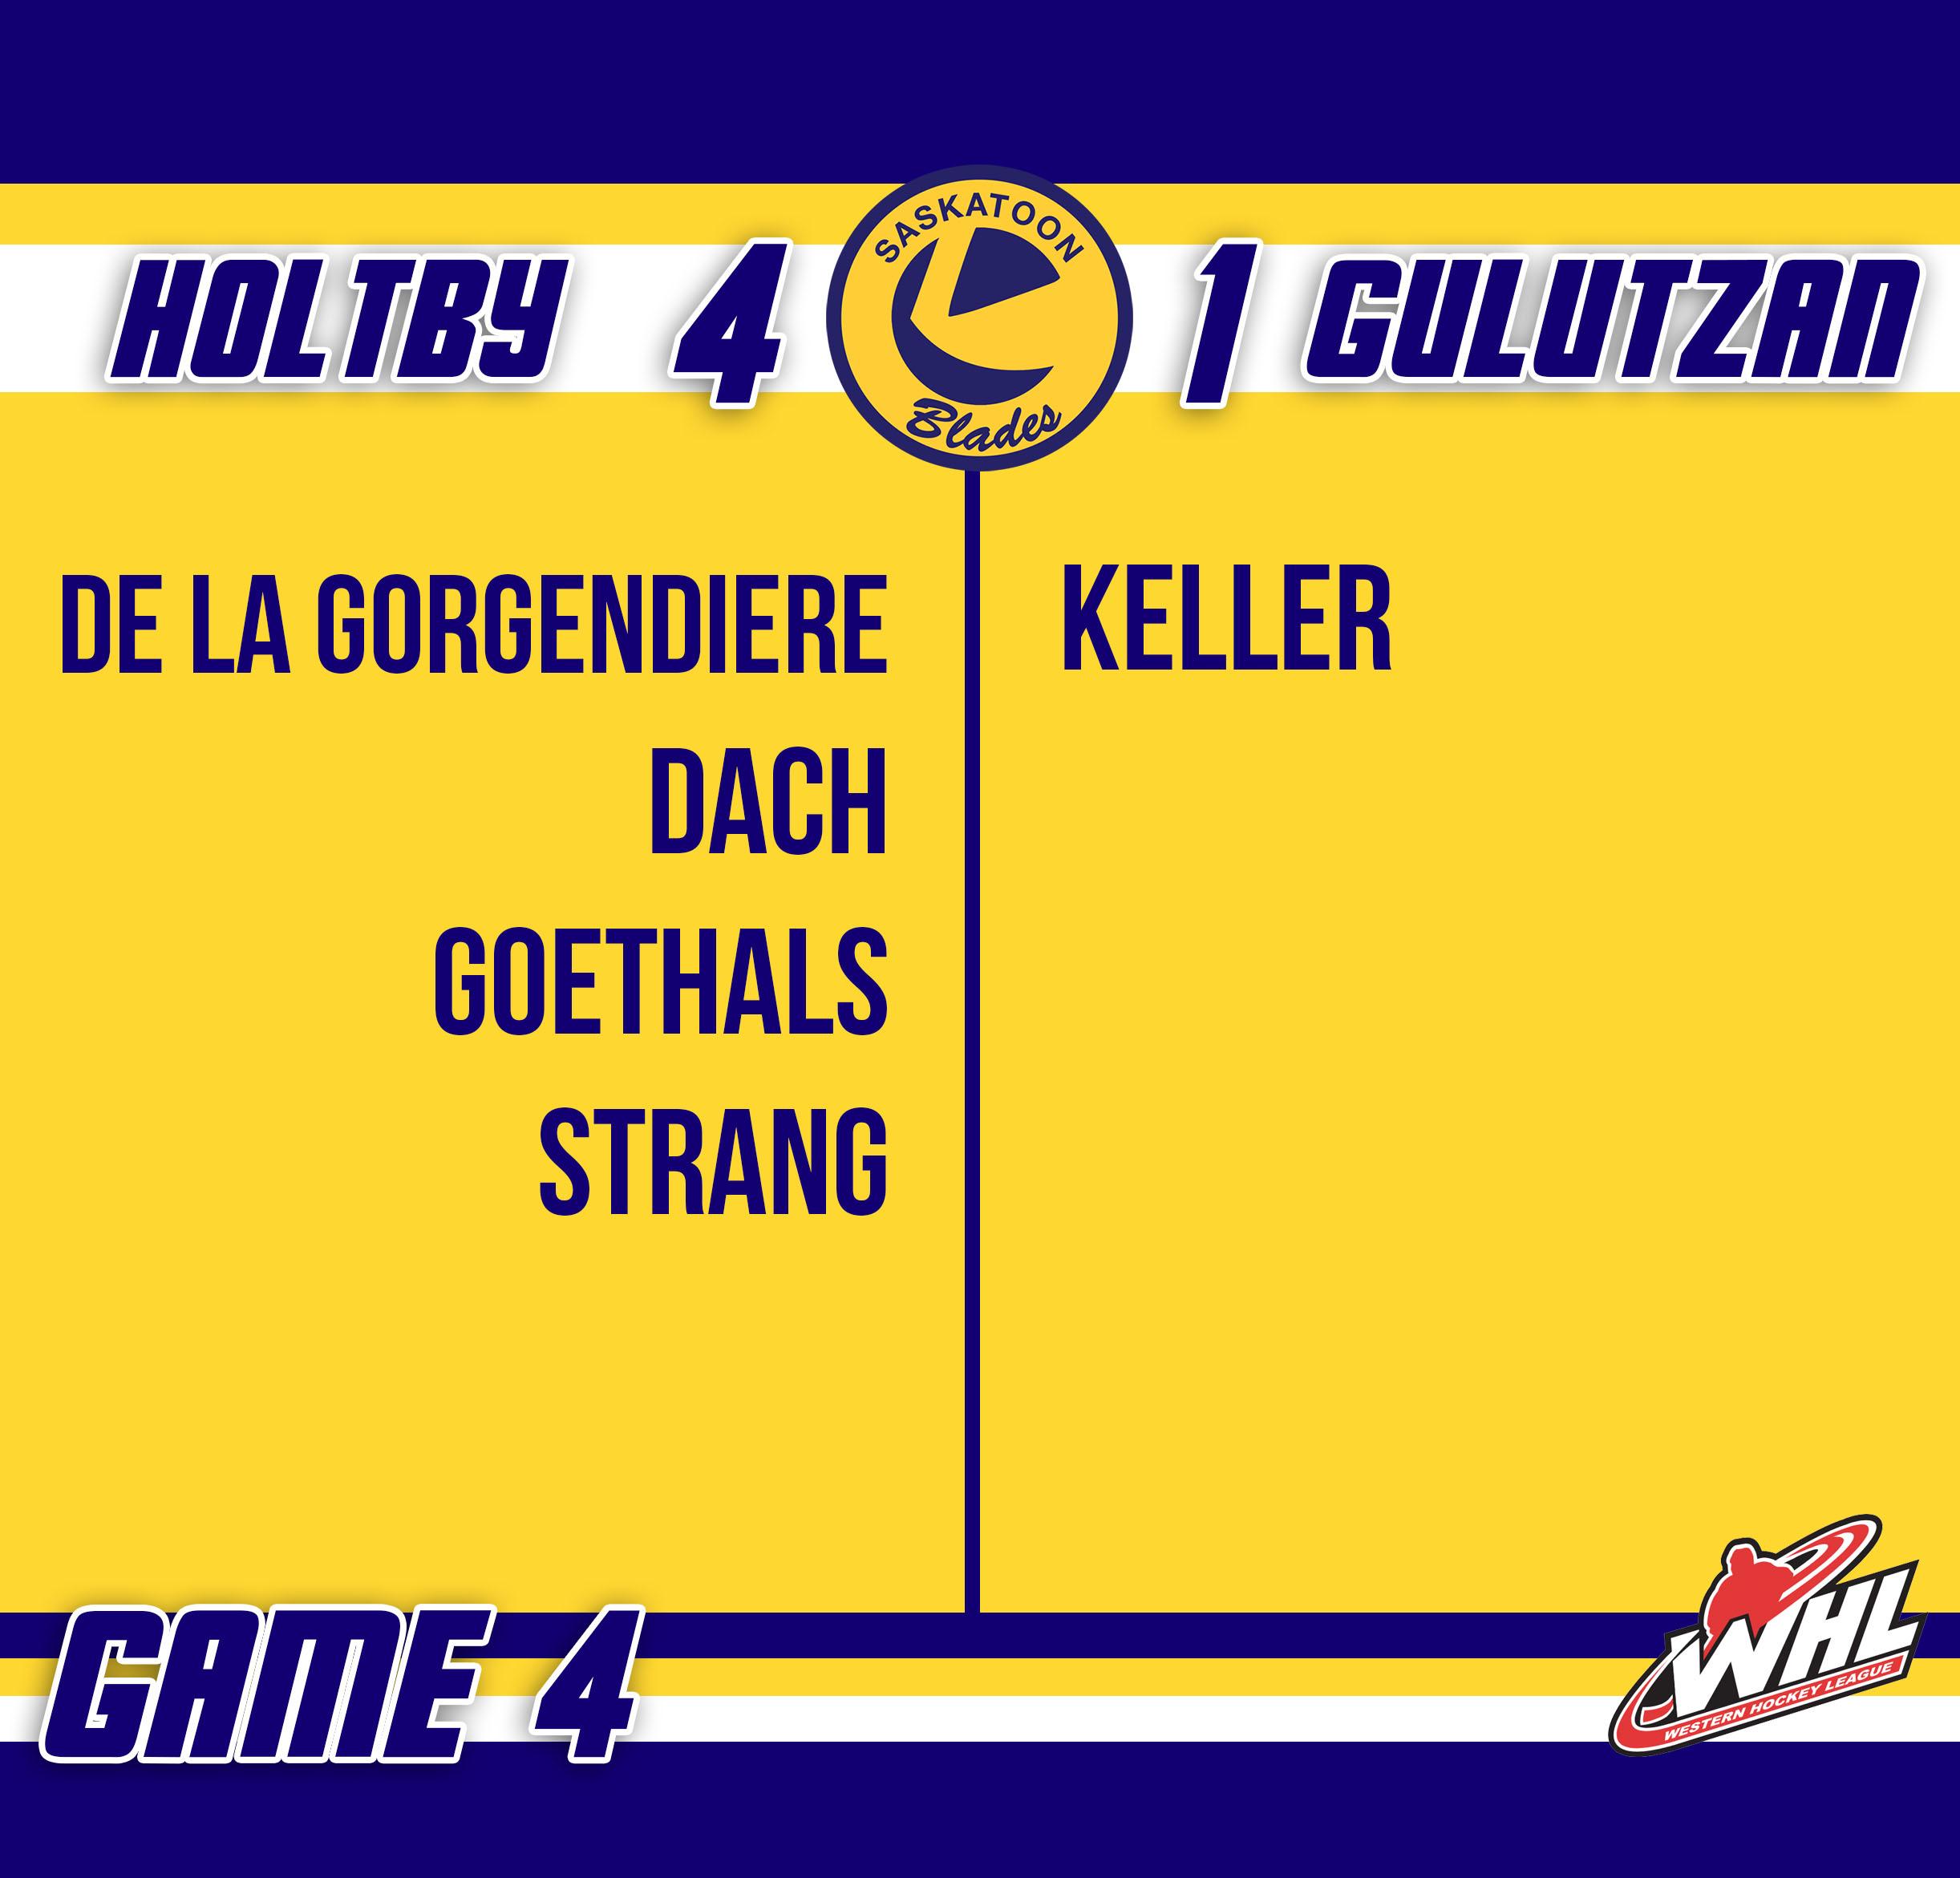 game 4 scoreboard